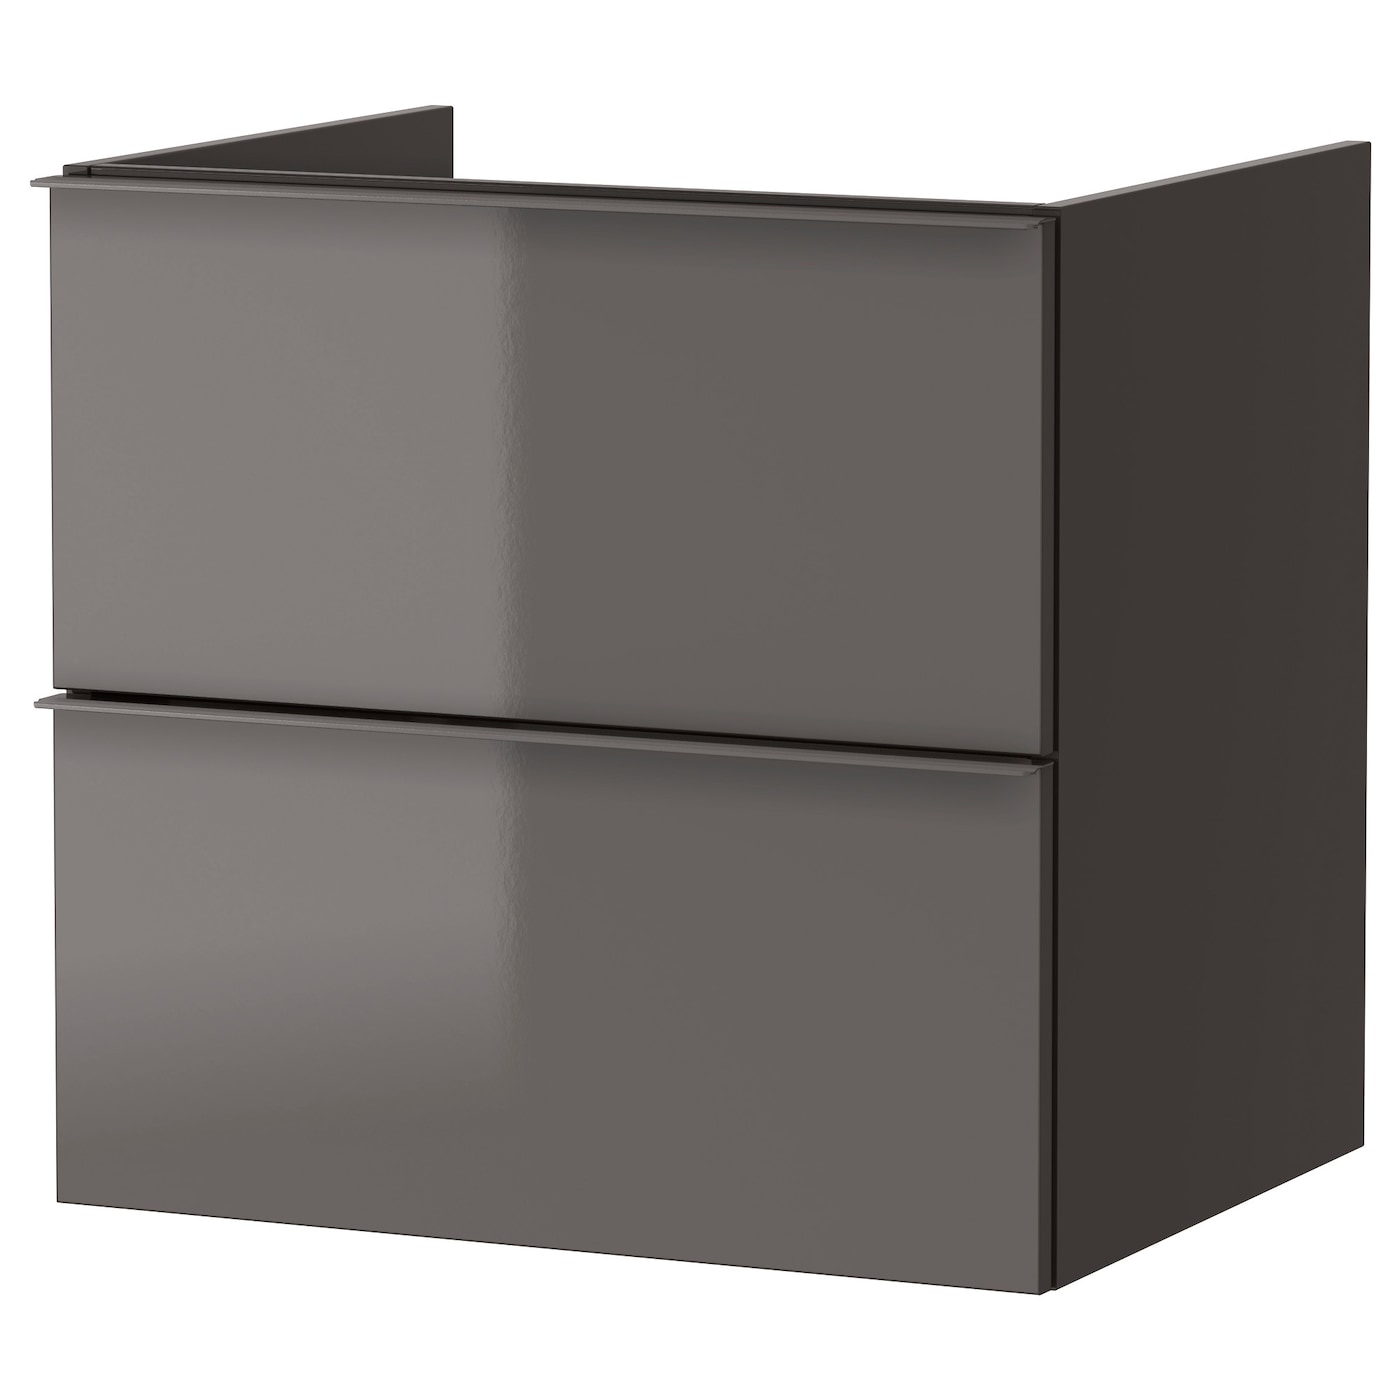 godmorgon meuble lavabo 2tir brillant gris 60 x 47 x 58 cm ikea. Black Bedroom Furniture Sets. Home Design Ideas